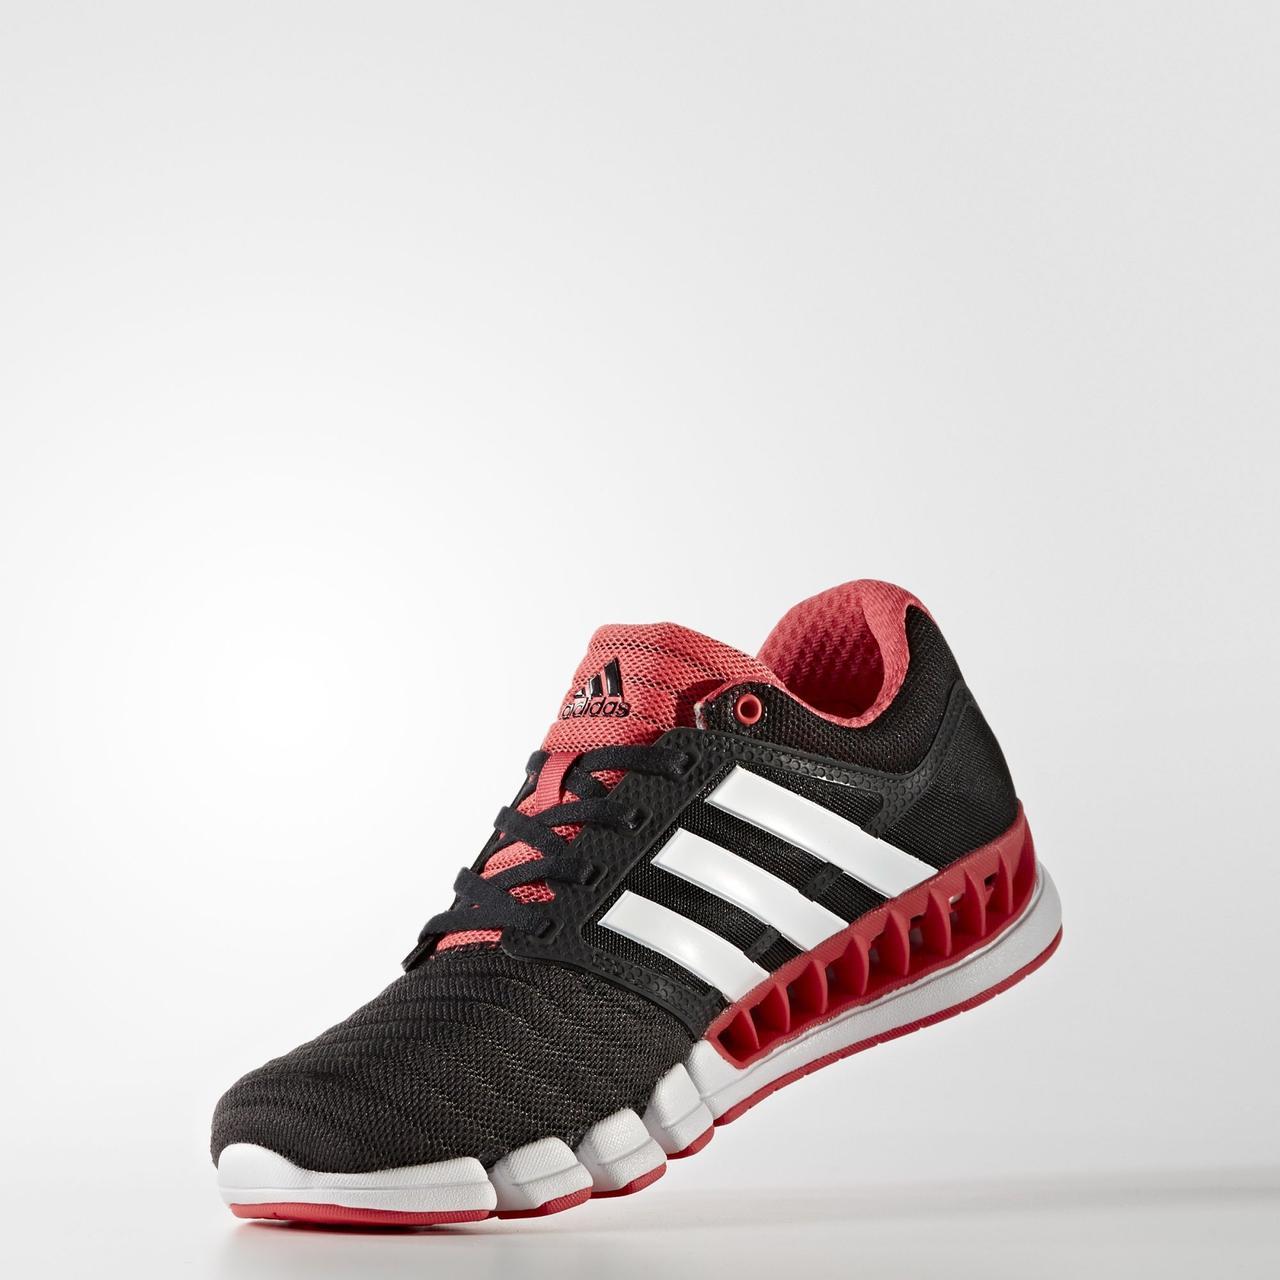 a9c3081d67da Женские кроссовки Adidas Performance Climacool Revolution (Артикул  BB1846)  - Адидас официальный интернет -